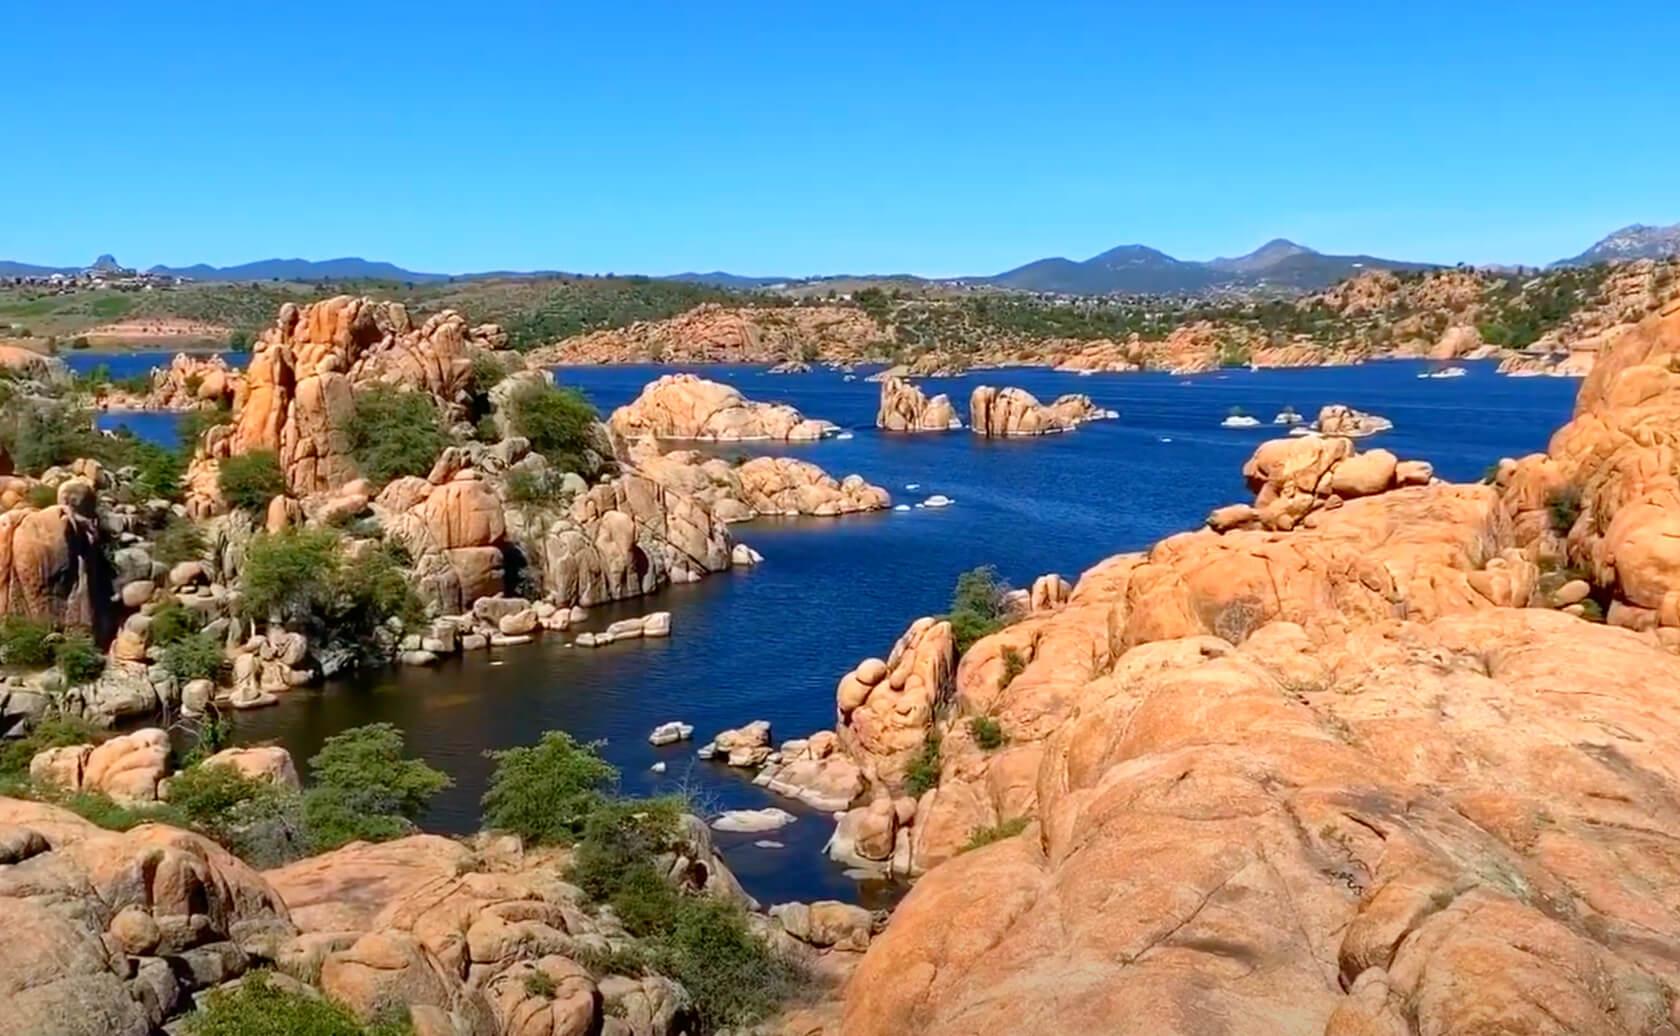 Watson-Lake-Fishing-Guide-Report-Arizona-07